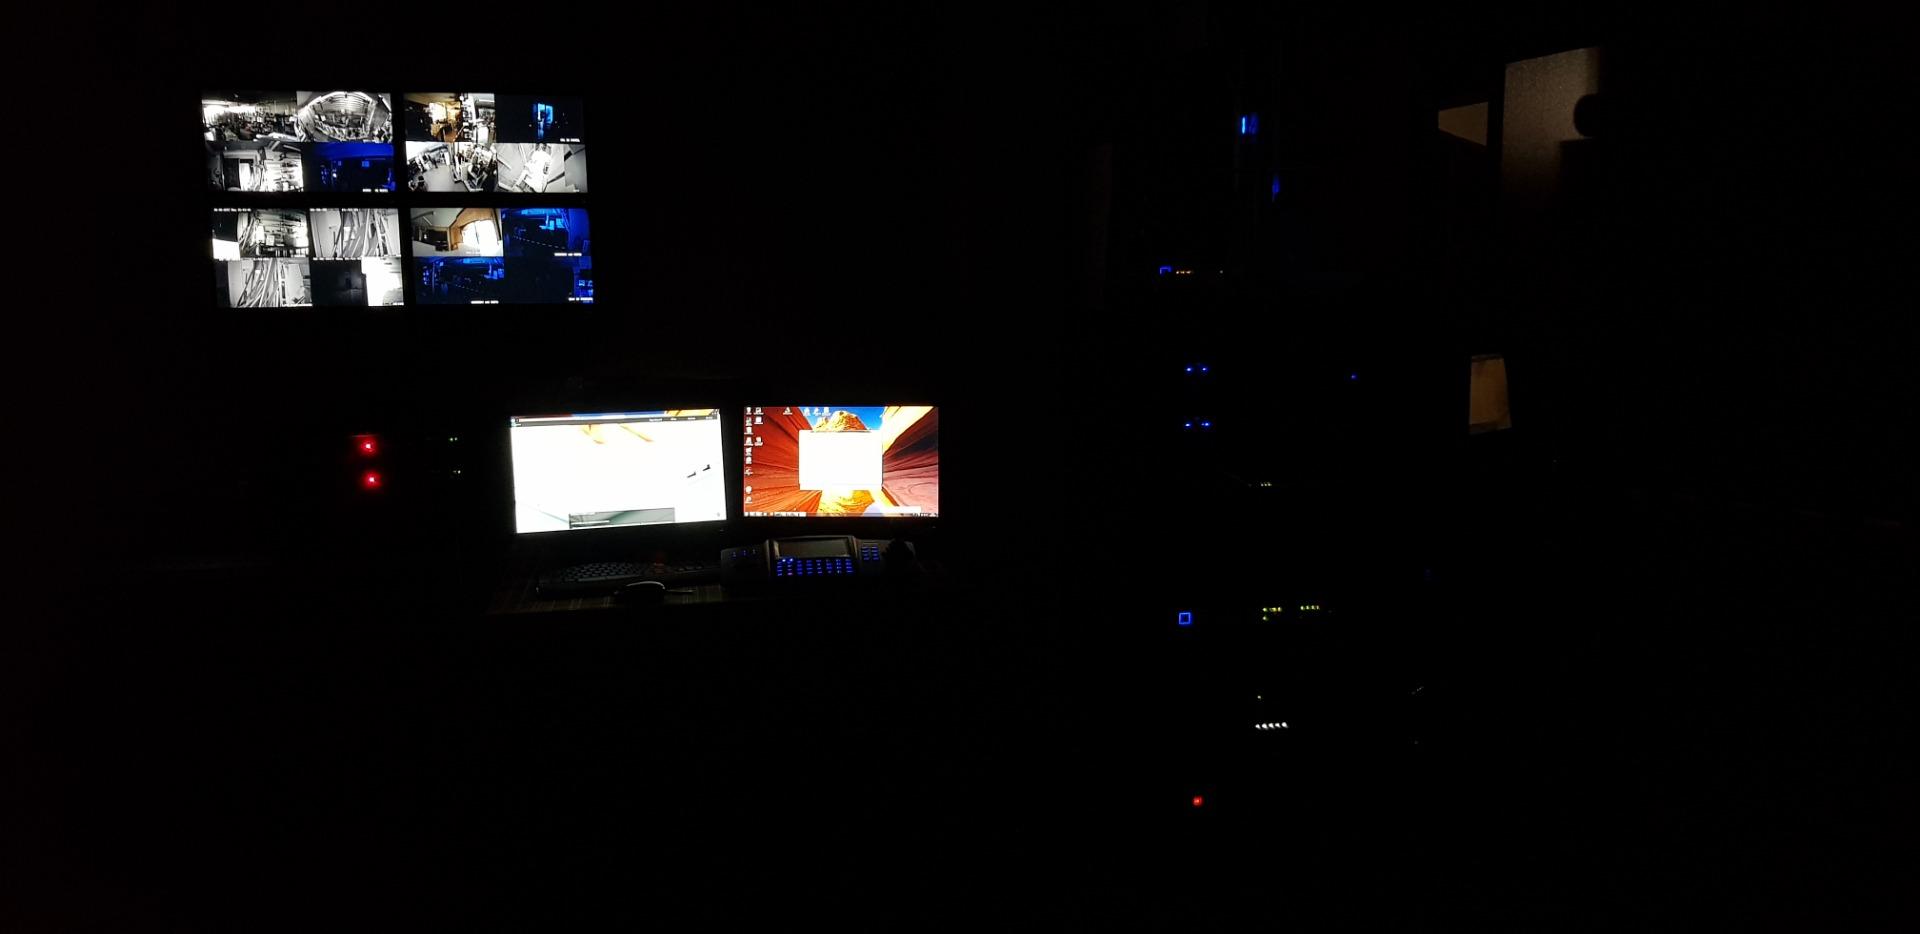 Surveillance nocturne